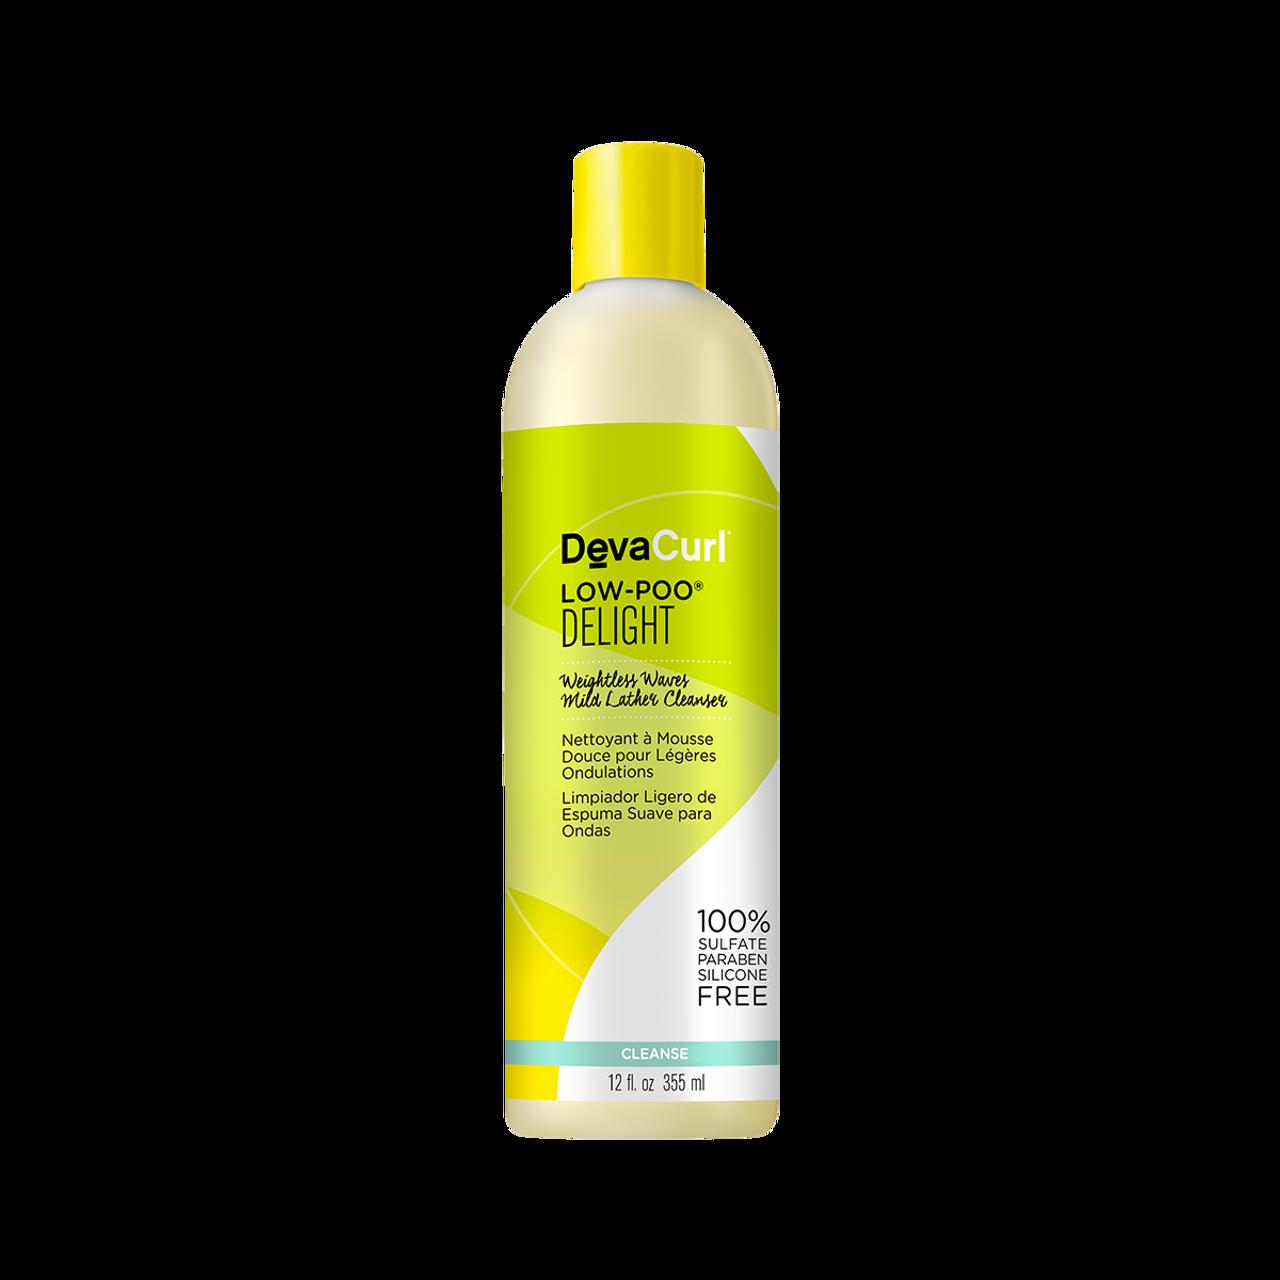 DevaCurl Low Poo Delight Shampoo